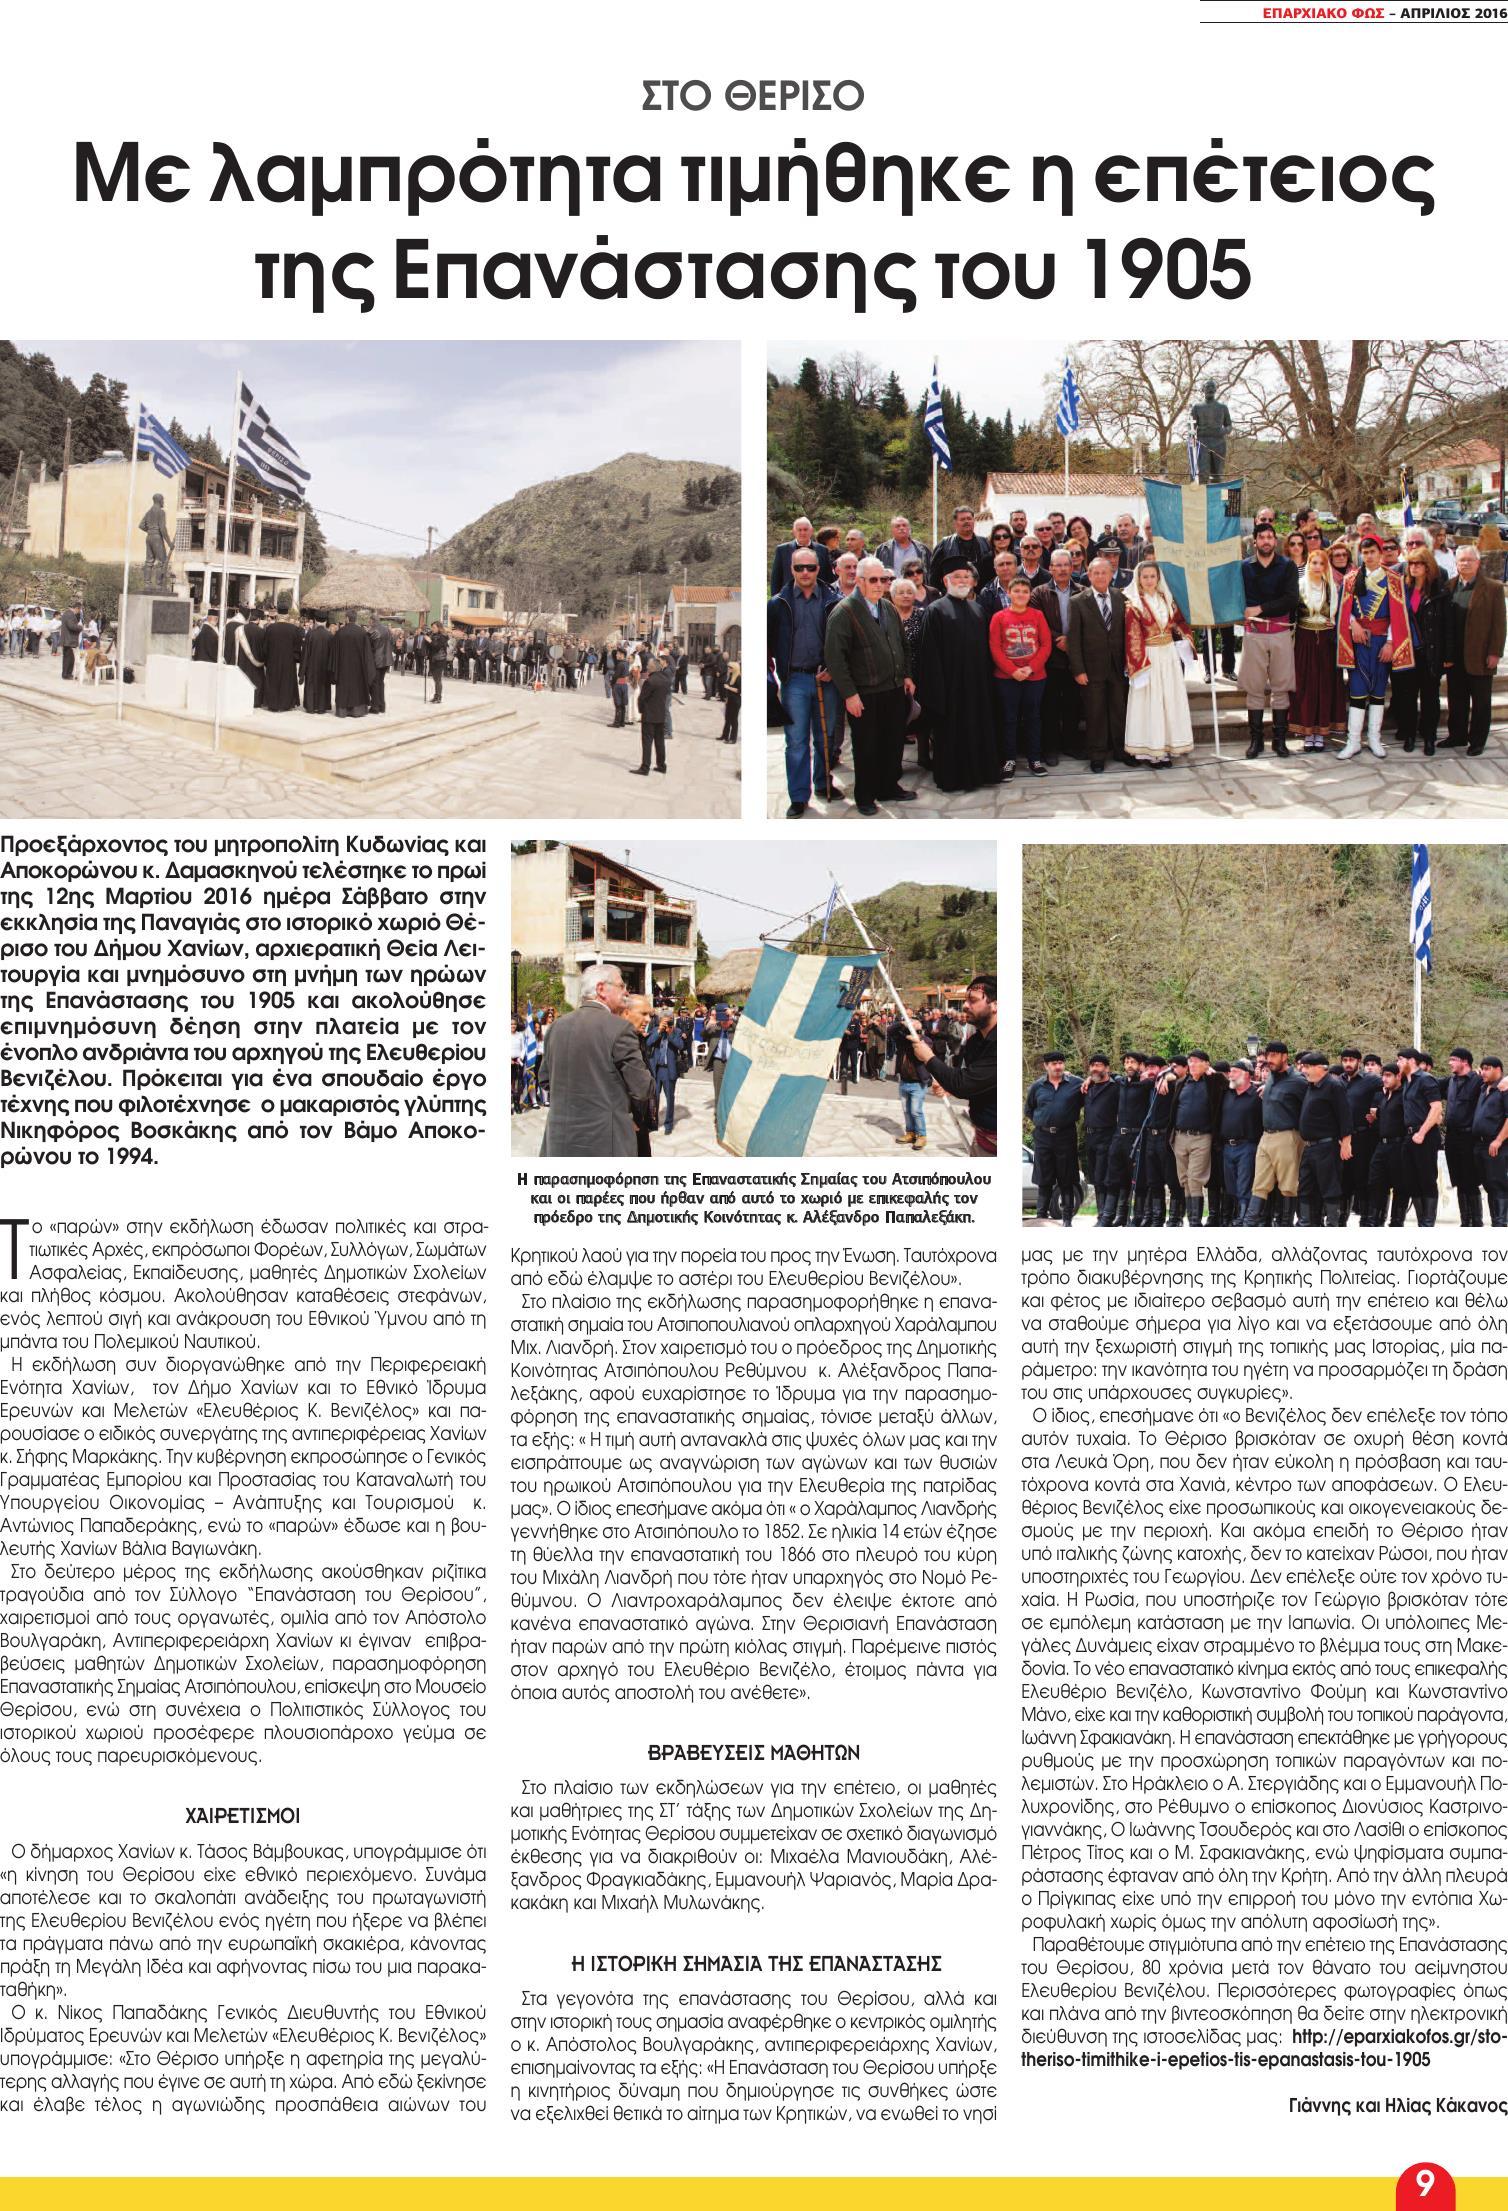 13 KAKANOS (Page 09)